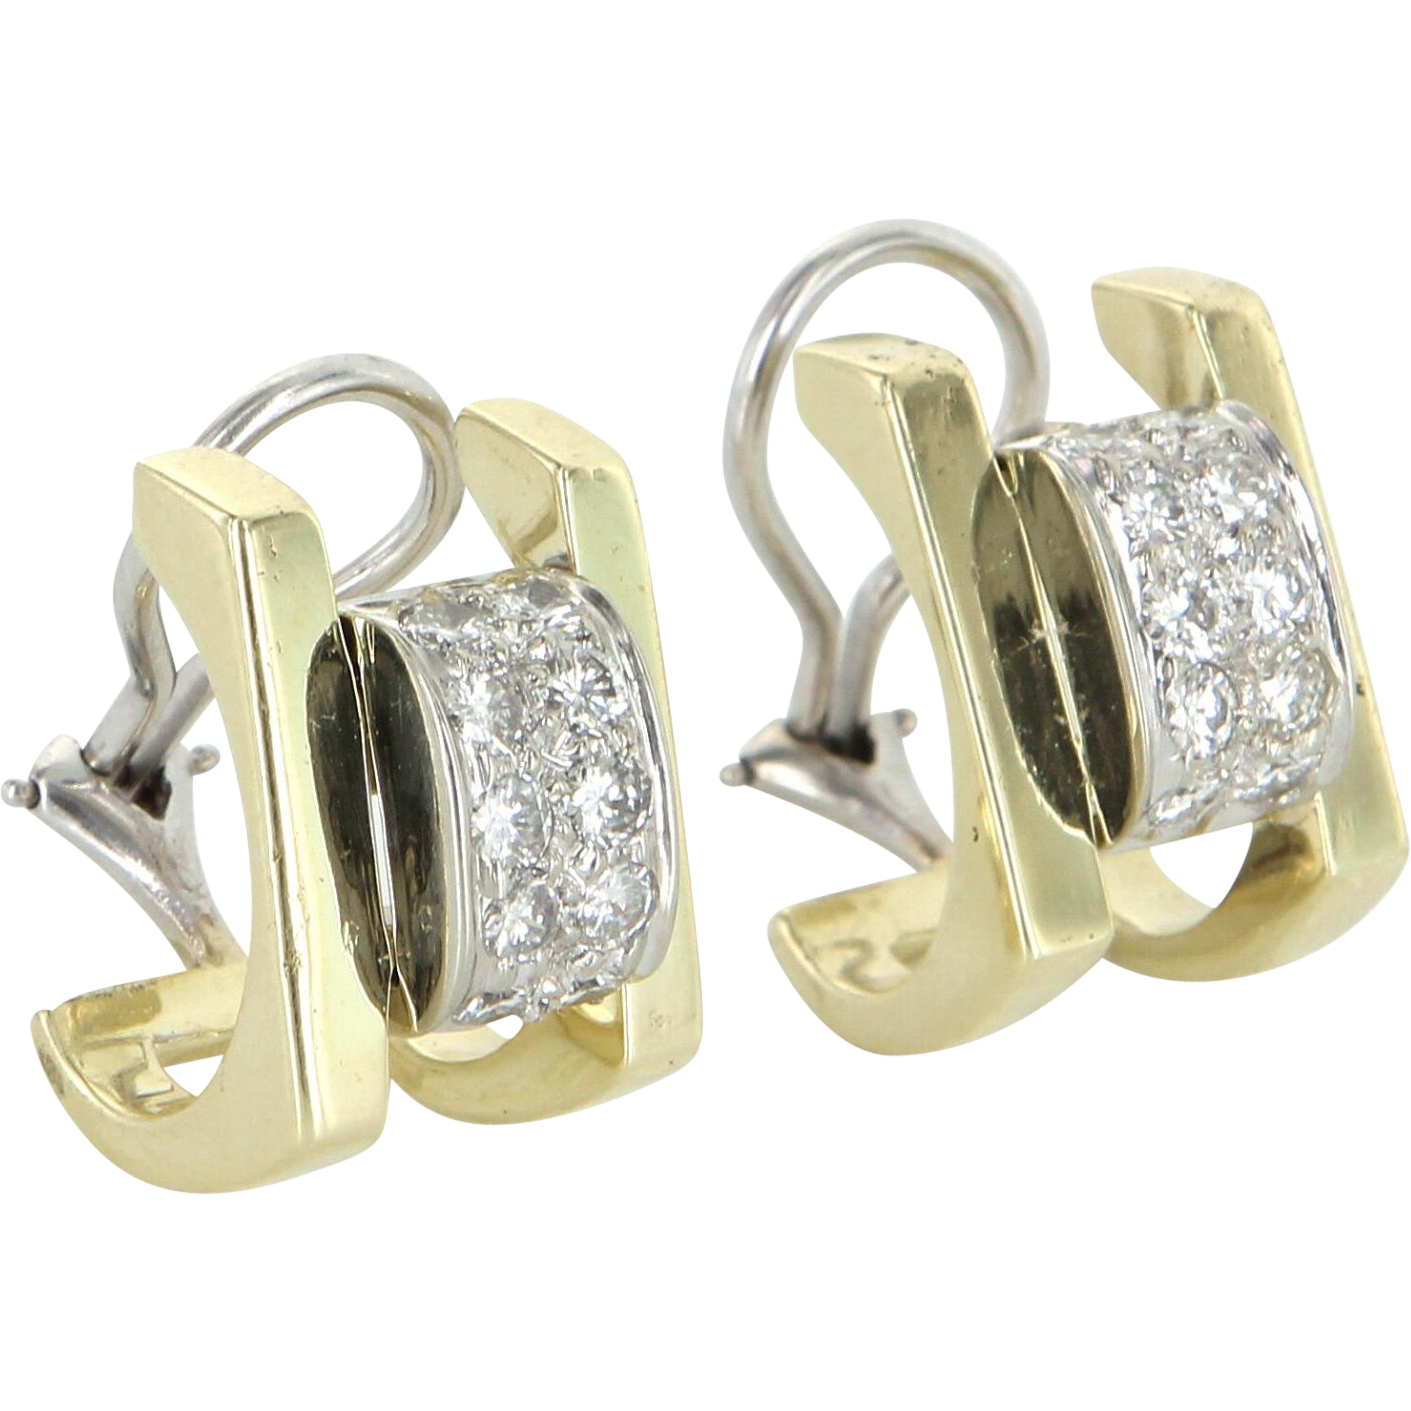 Retro Vintage 1ct Diamond Shrimp Earrings 14 Karat Yellow Gold Estate Fine Jewelry